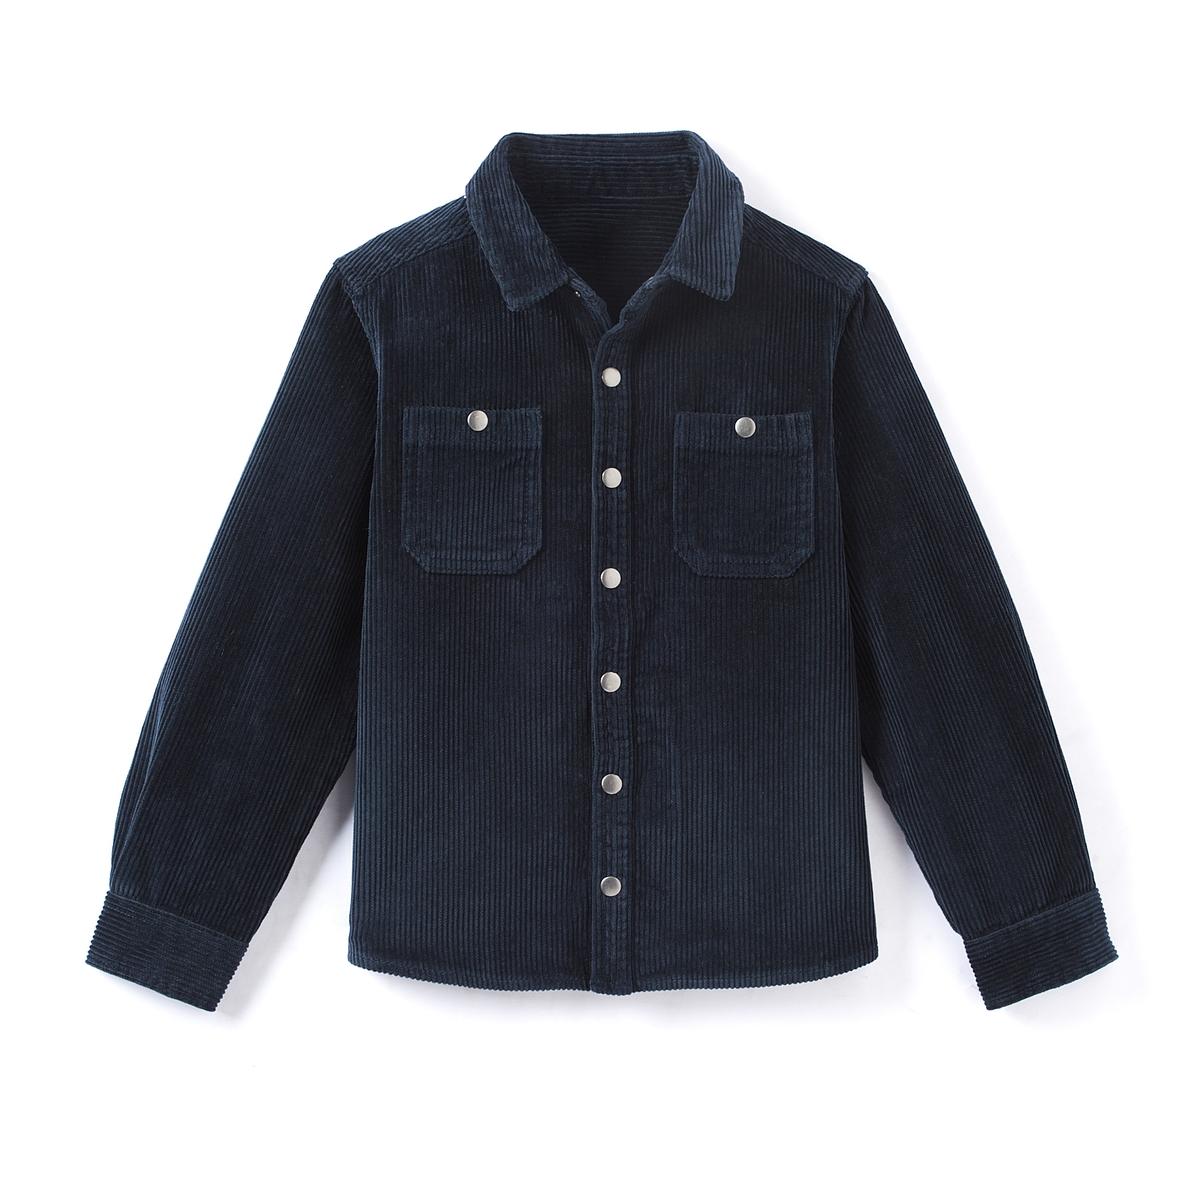 Рубашка из велюра 3-12 лет